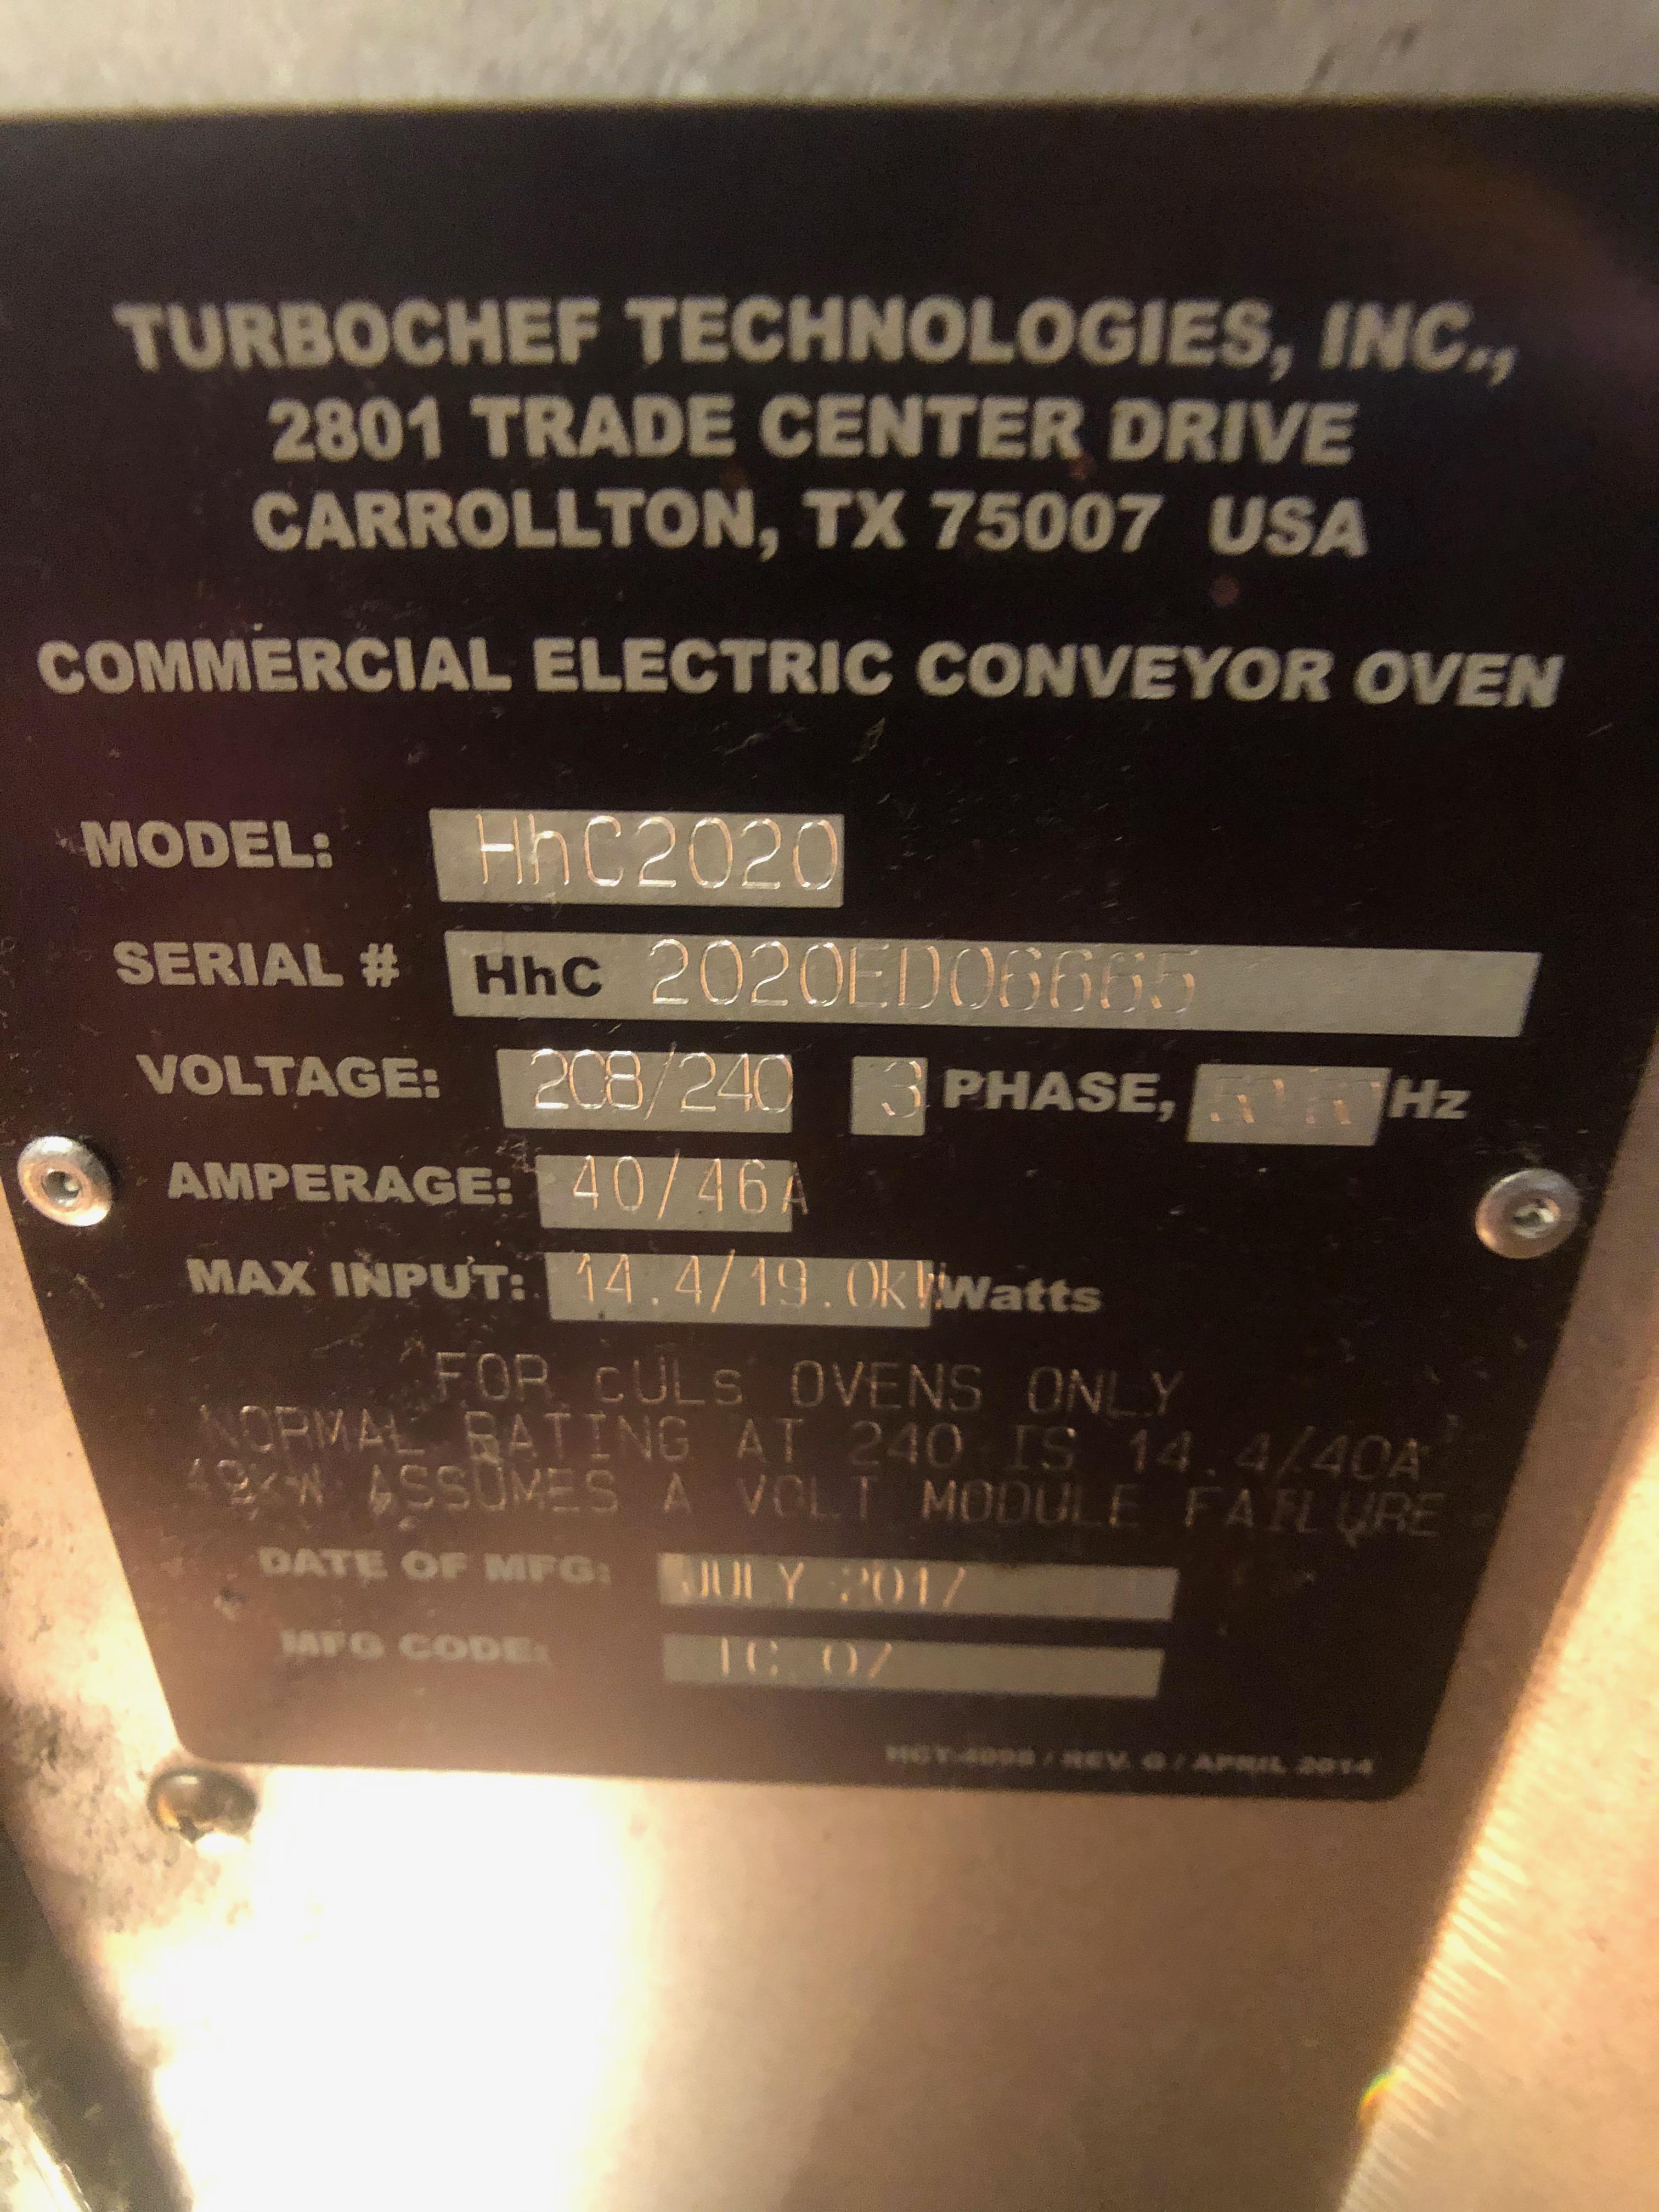 TurboChef Conveyor Oven, Model HHC2020, S/N HHC2020ED06665 - Image 4 of 7